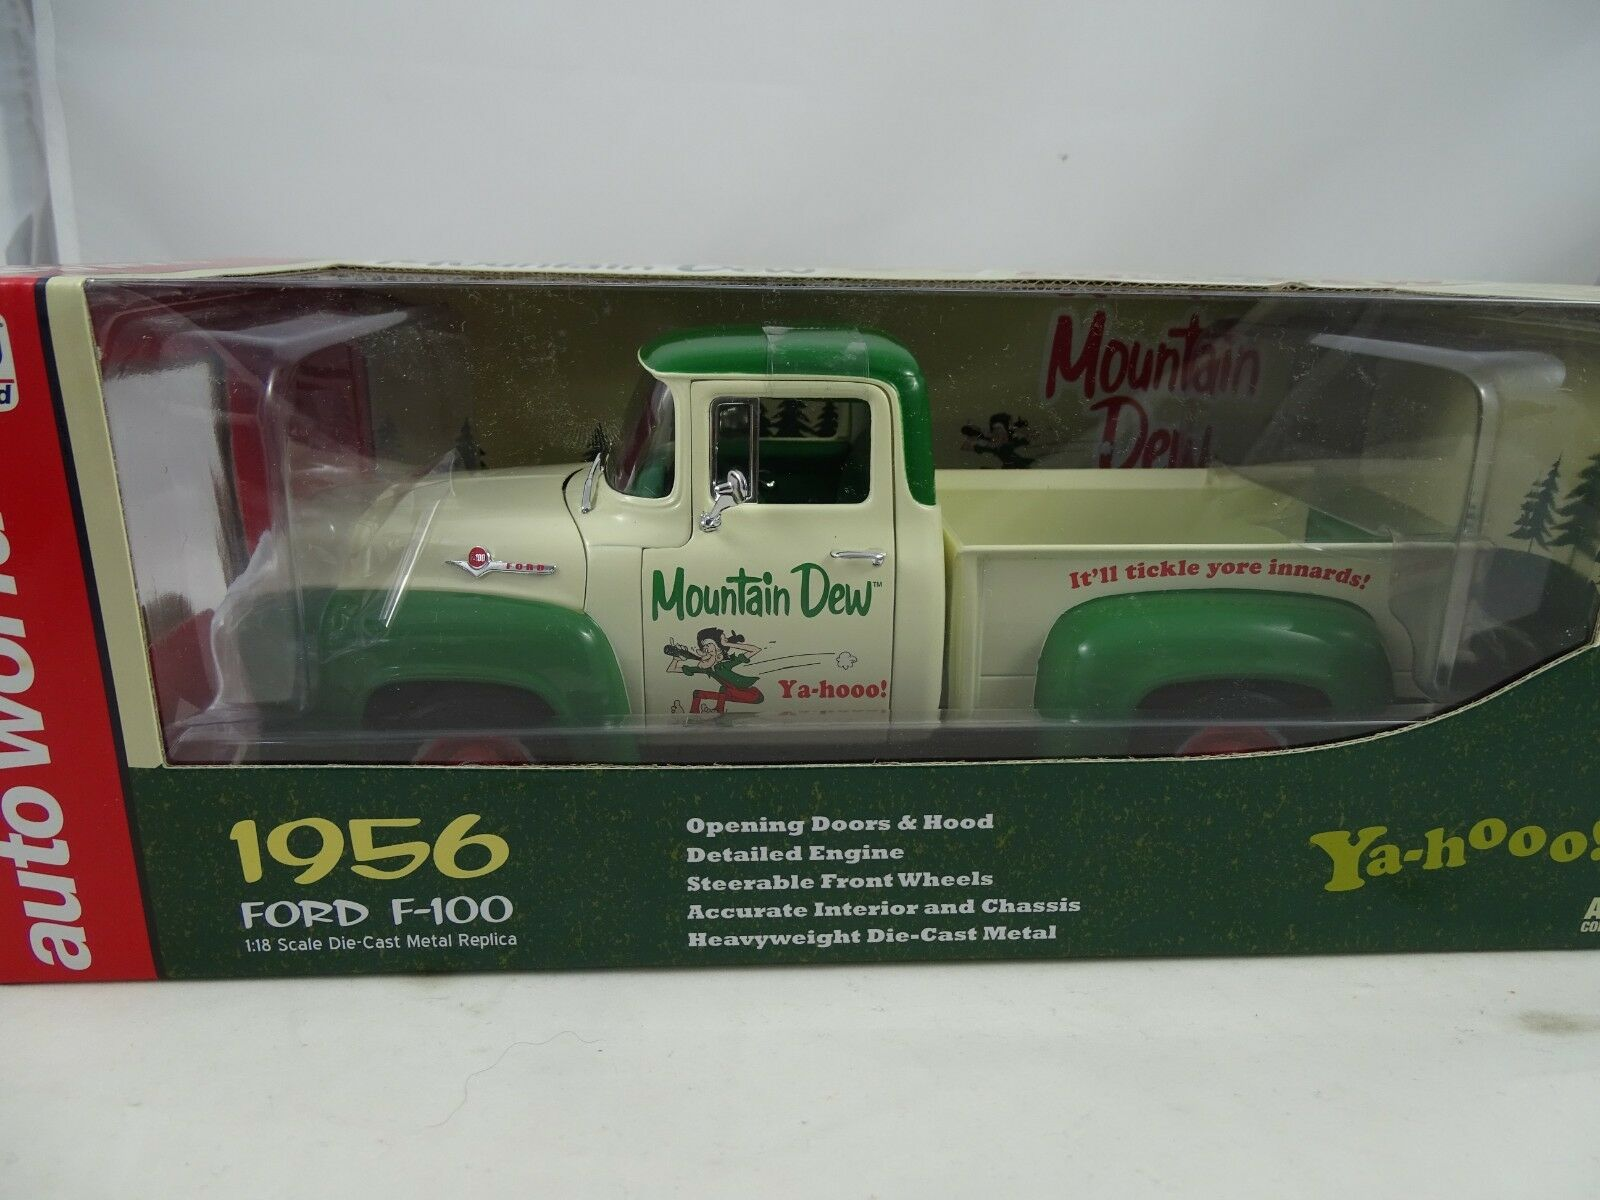 1 18 Ertl Autoworld Aw211 06 Mountain Dew 1956 Ford F-100 Crema   verde